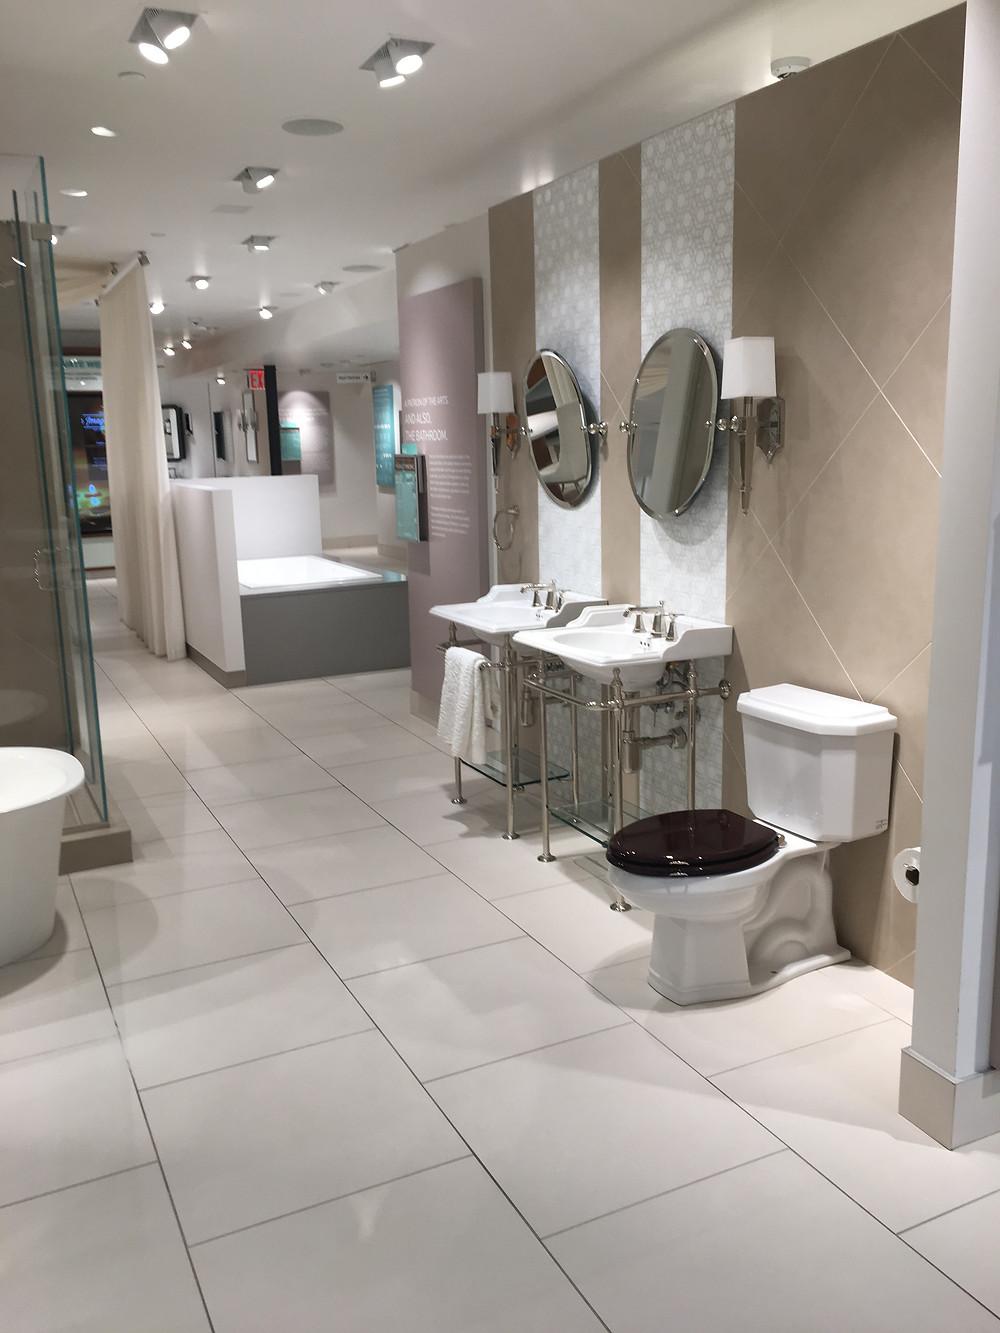 Entering bath displays, Pirch showroom, NYC.